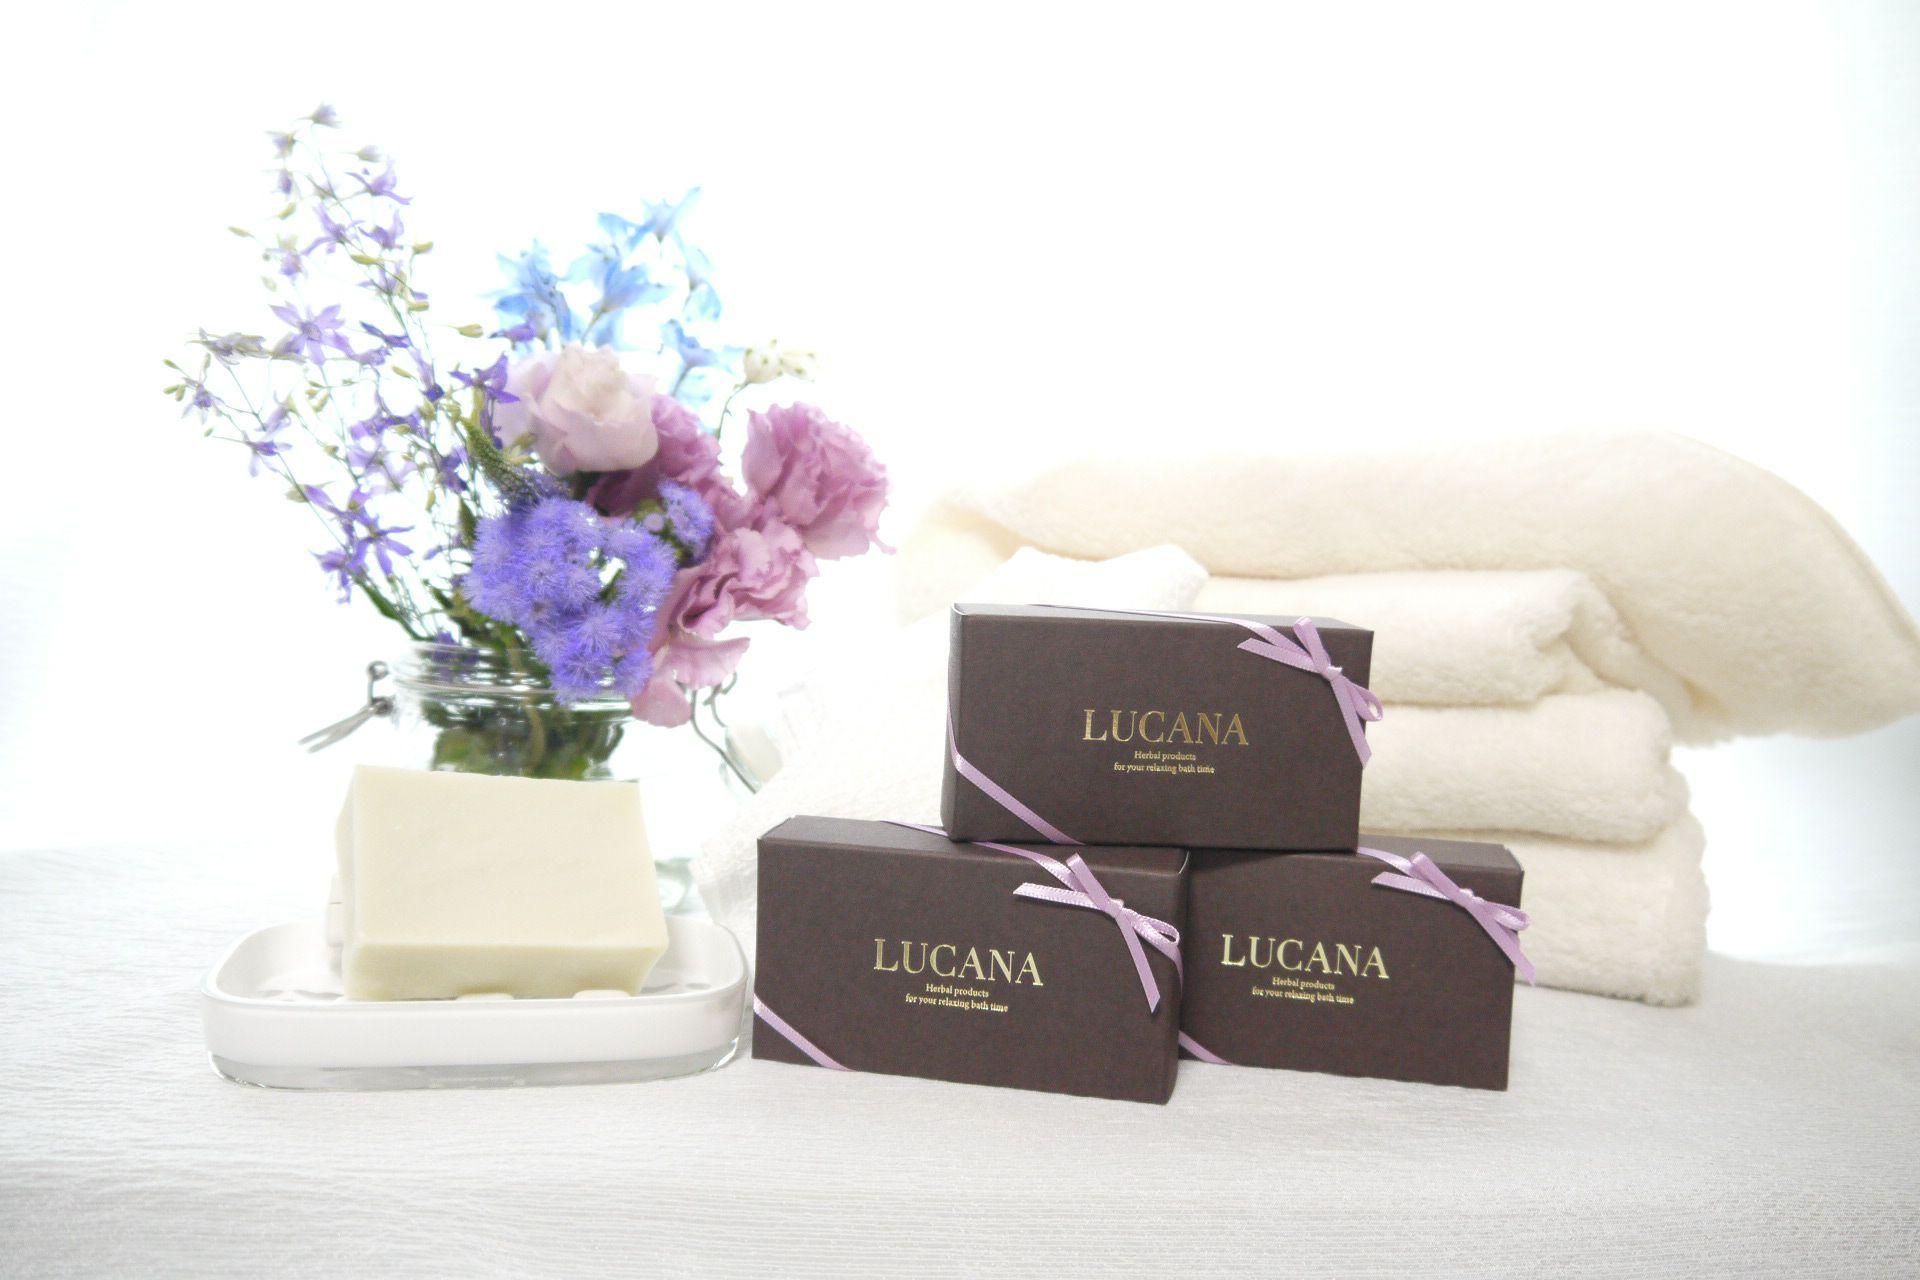 Premium Lavender Soap (プレミアム ラベンダー ソープ)